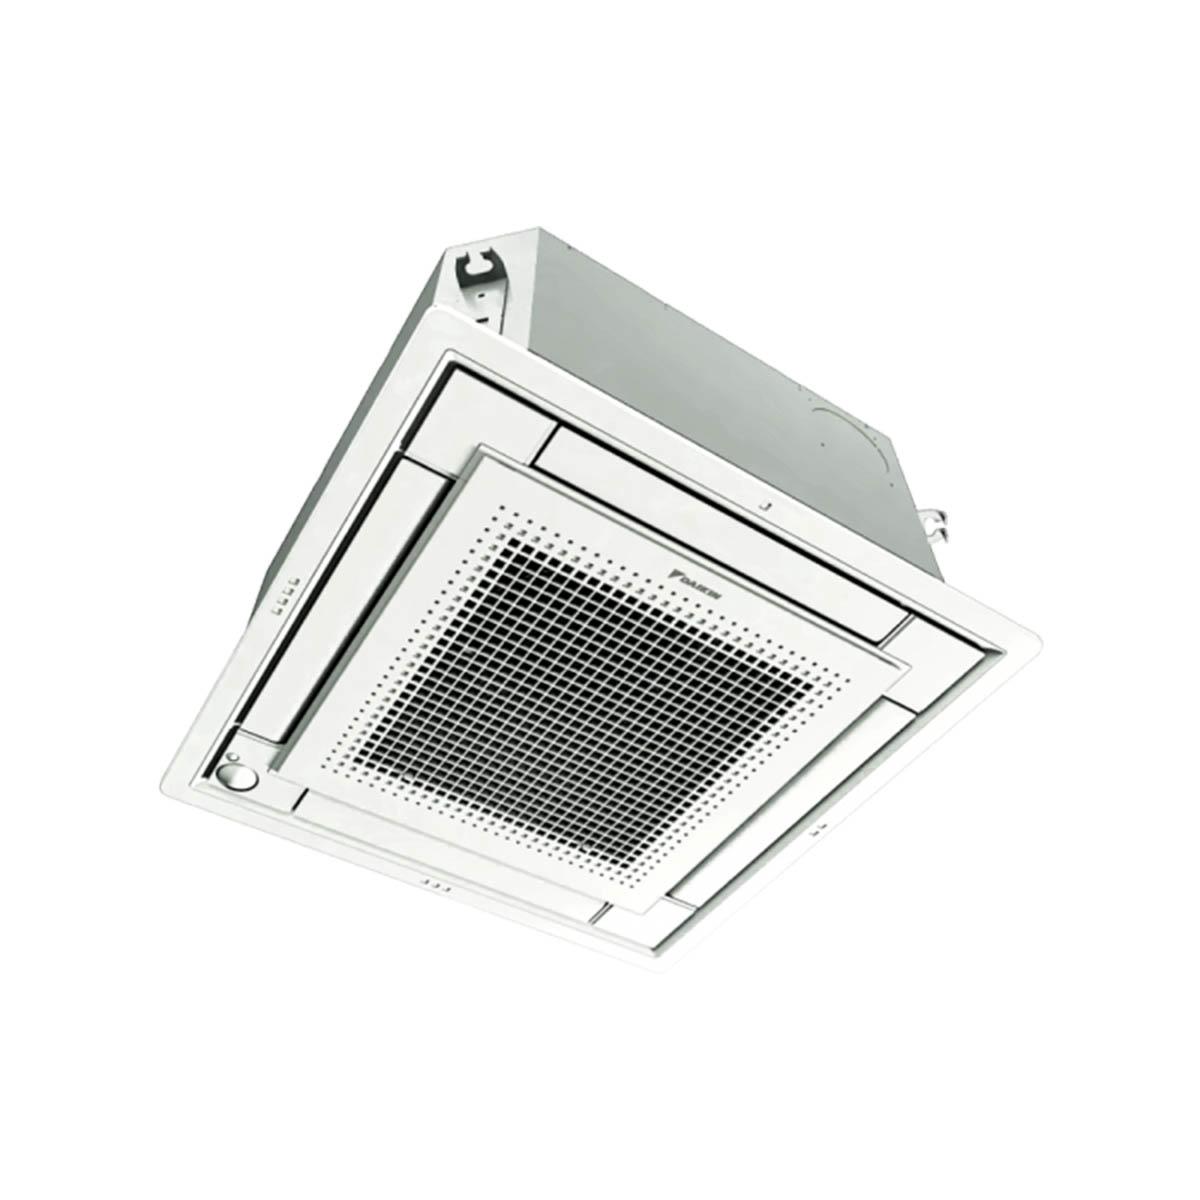 Unitate interna tip Caseta Daikin Bluevolution FFA - A9,A+,Inverter 2